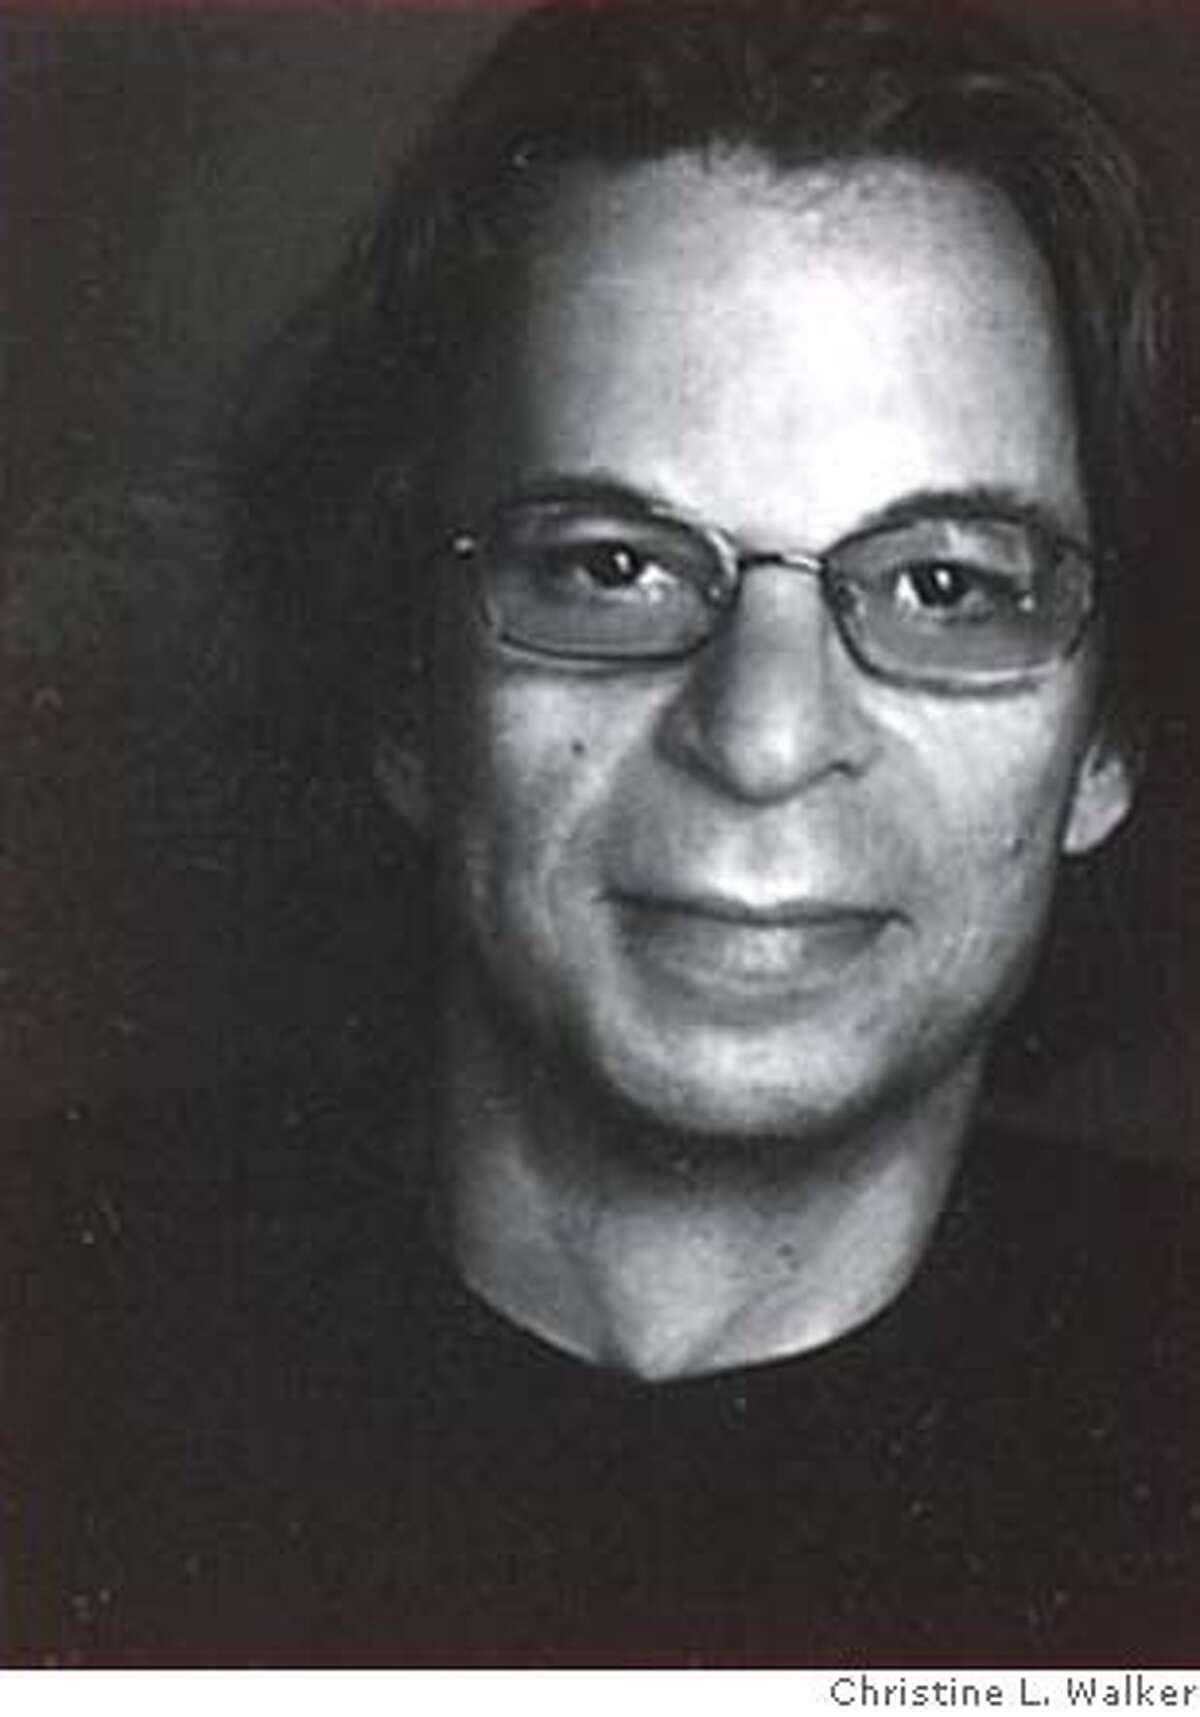 John Strausbaugh